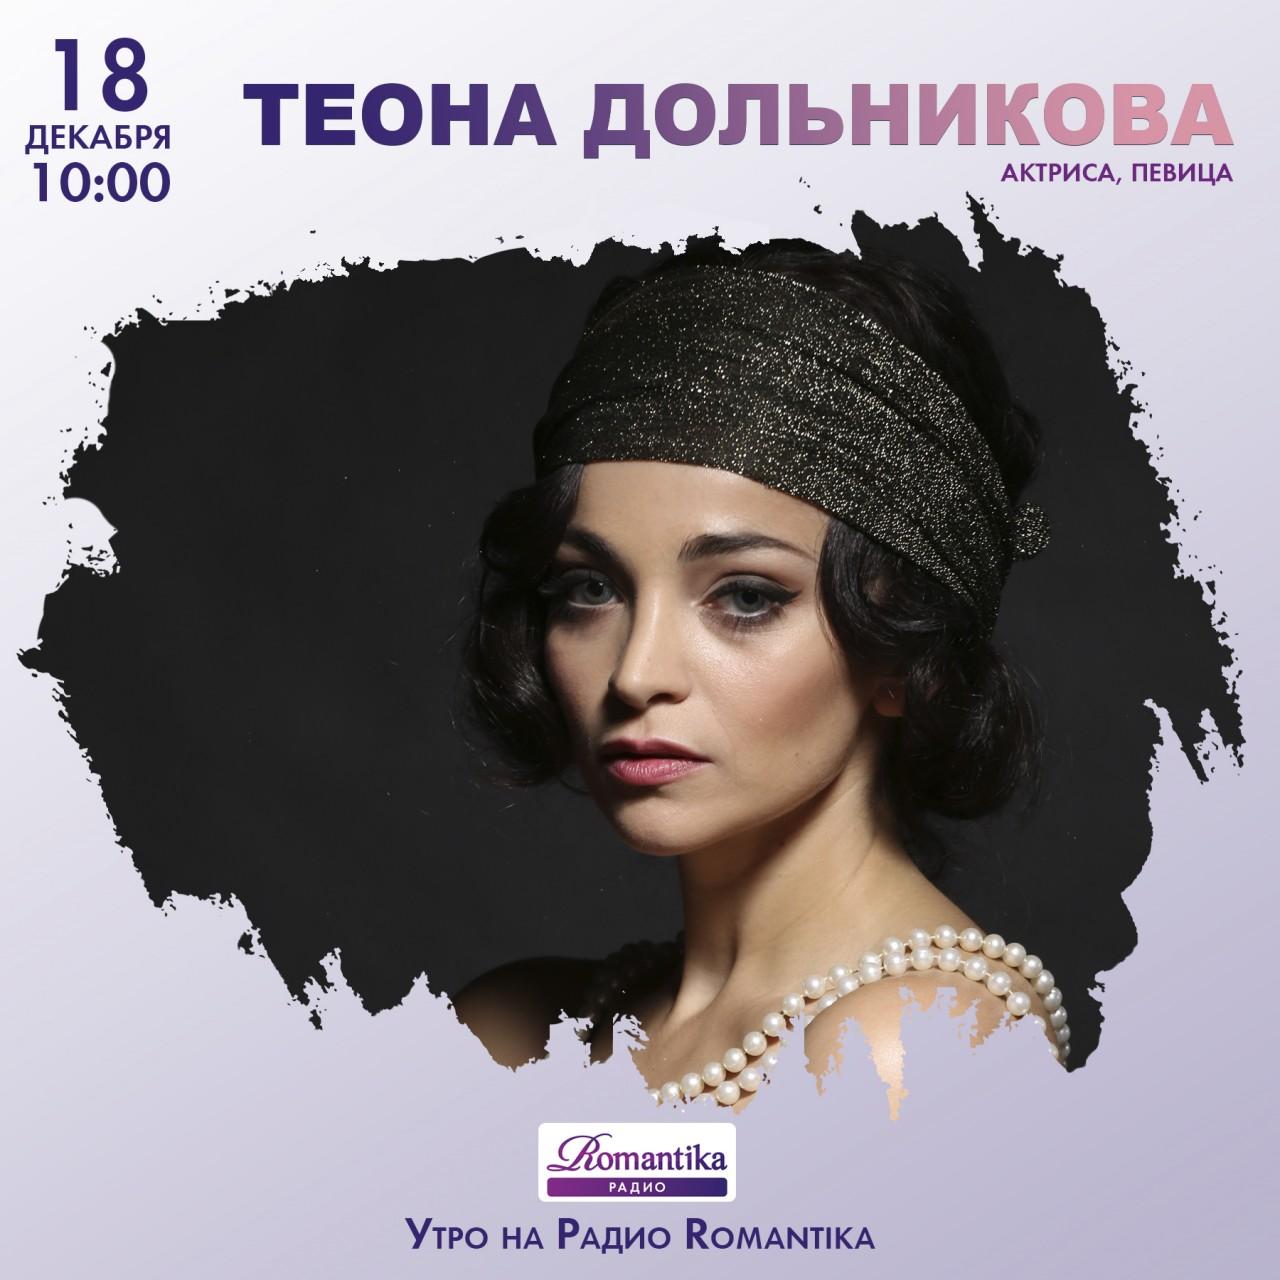 Радио Romantika: 18 декабря …